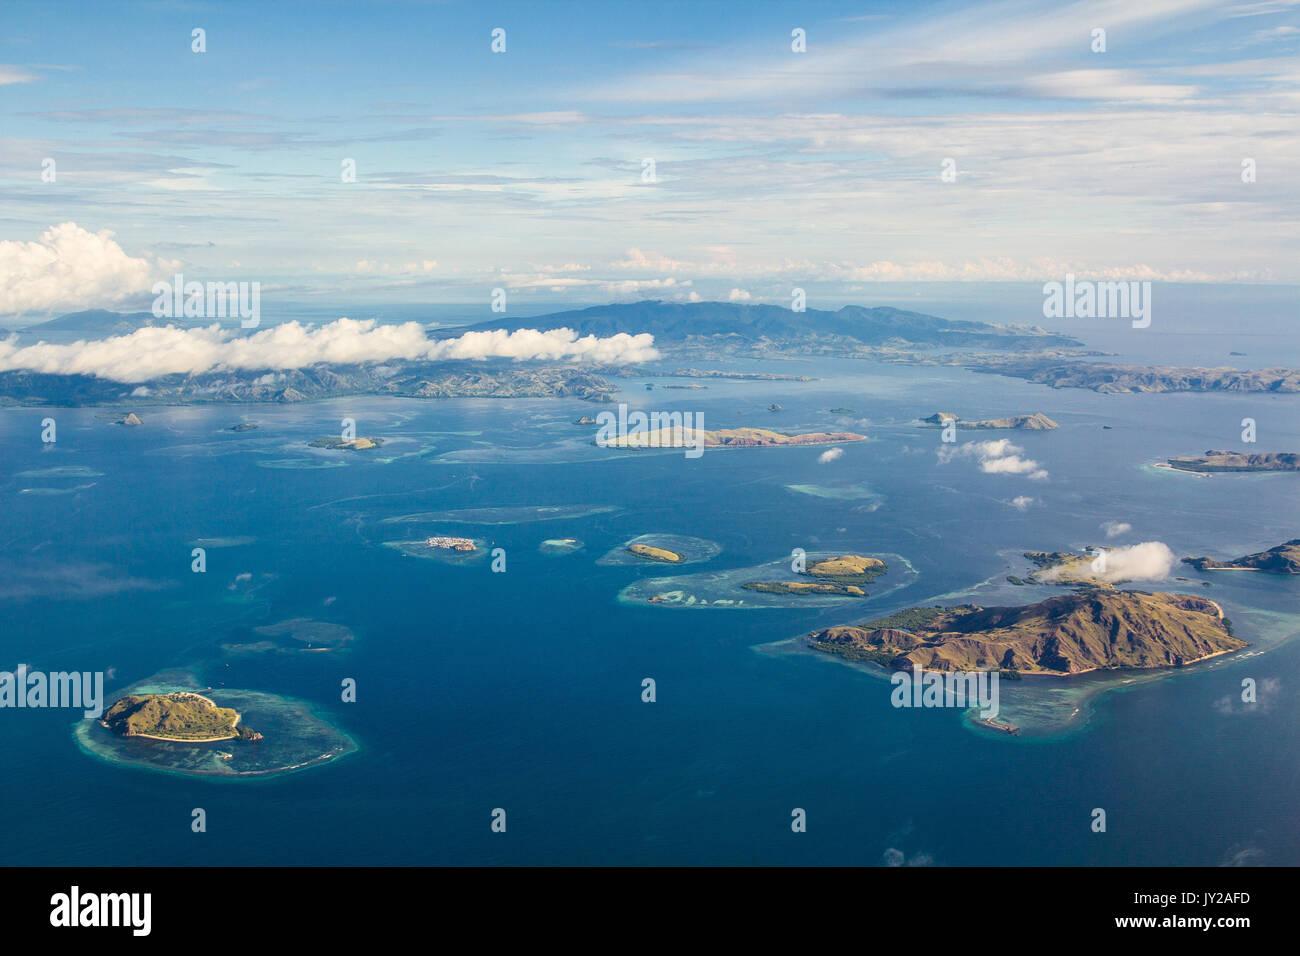 aerial photo of islands in komodo national park - Stock Image